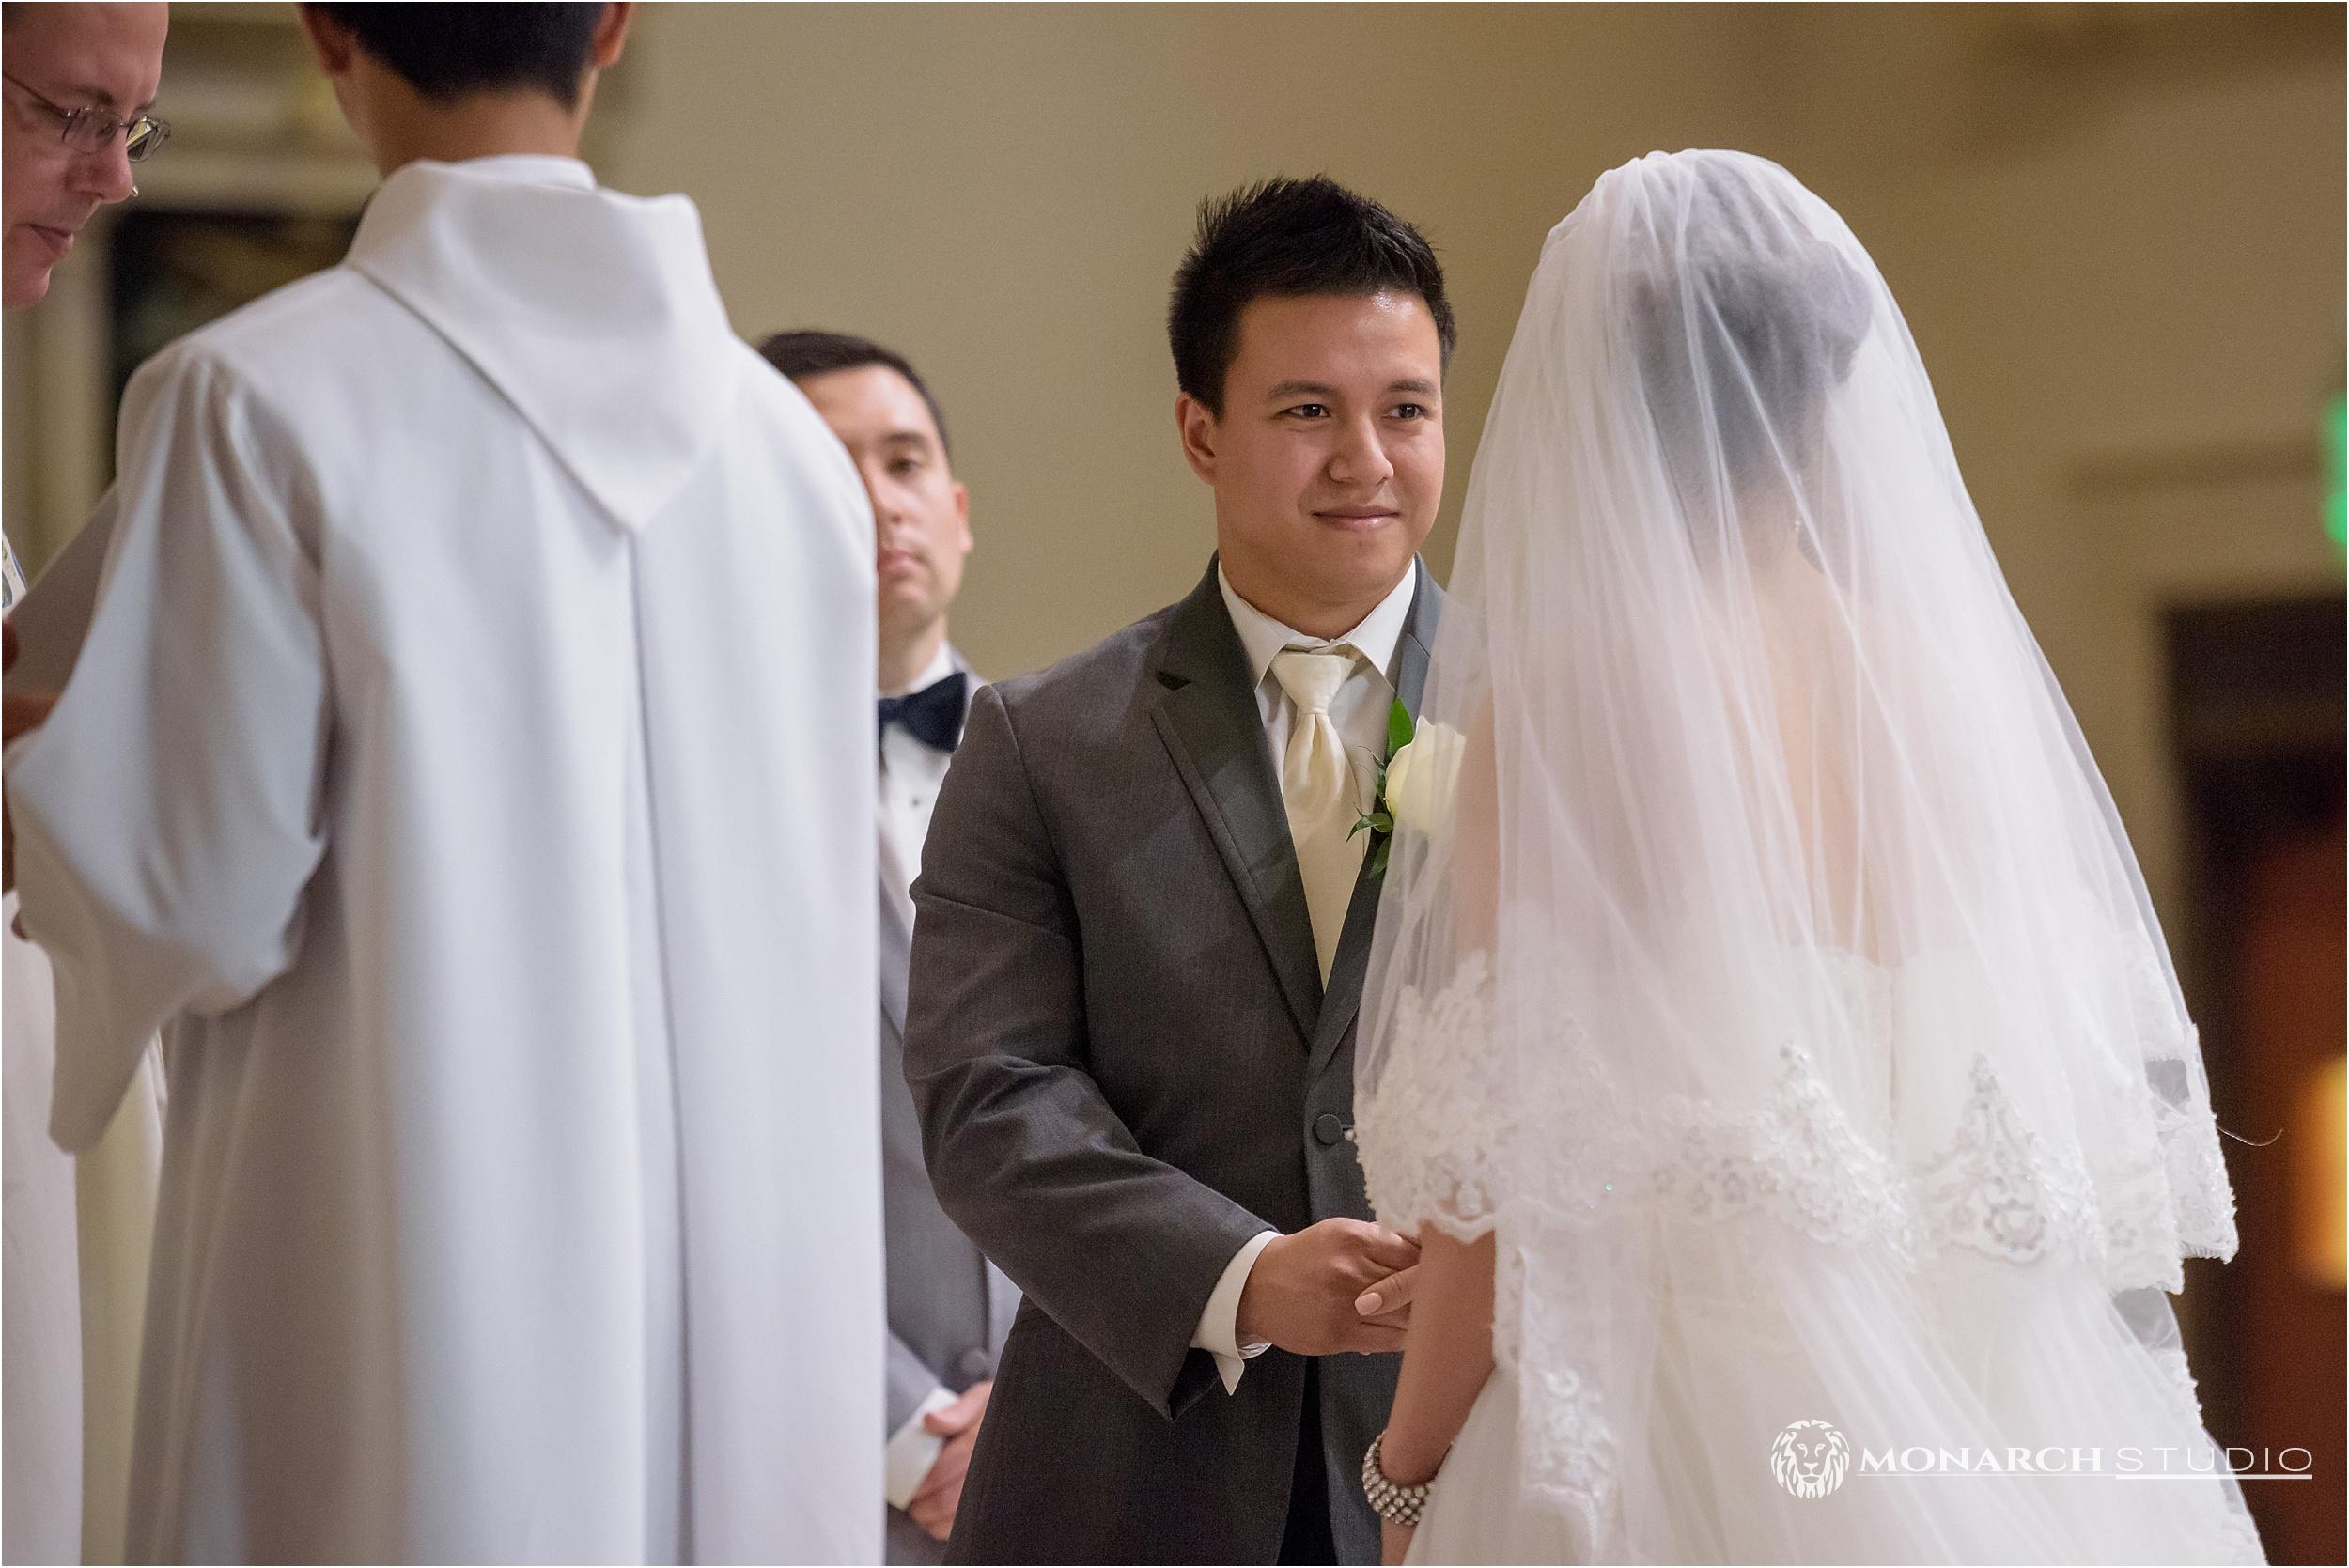 wedding-photographer-in-st-augustine-florida-treasury-049.jpg